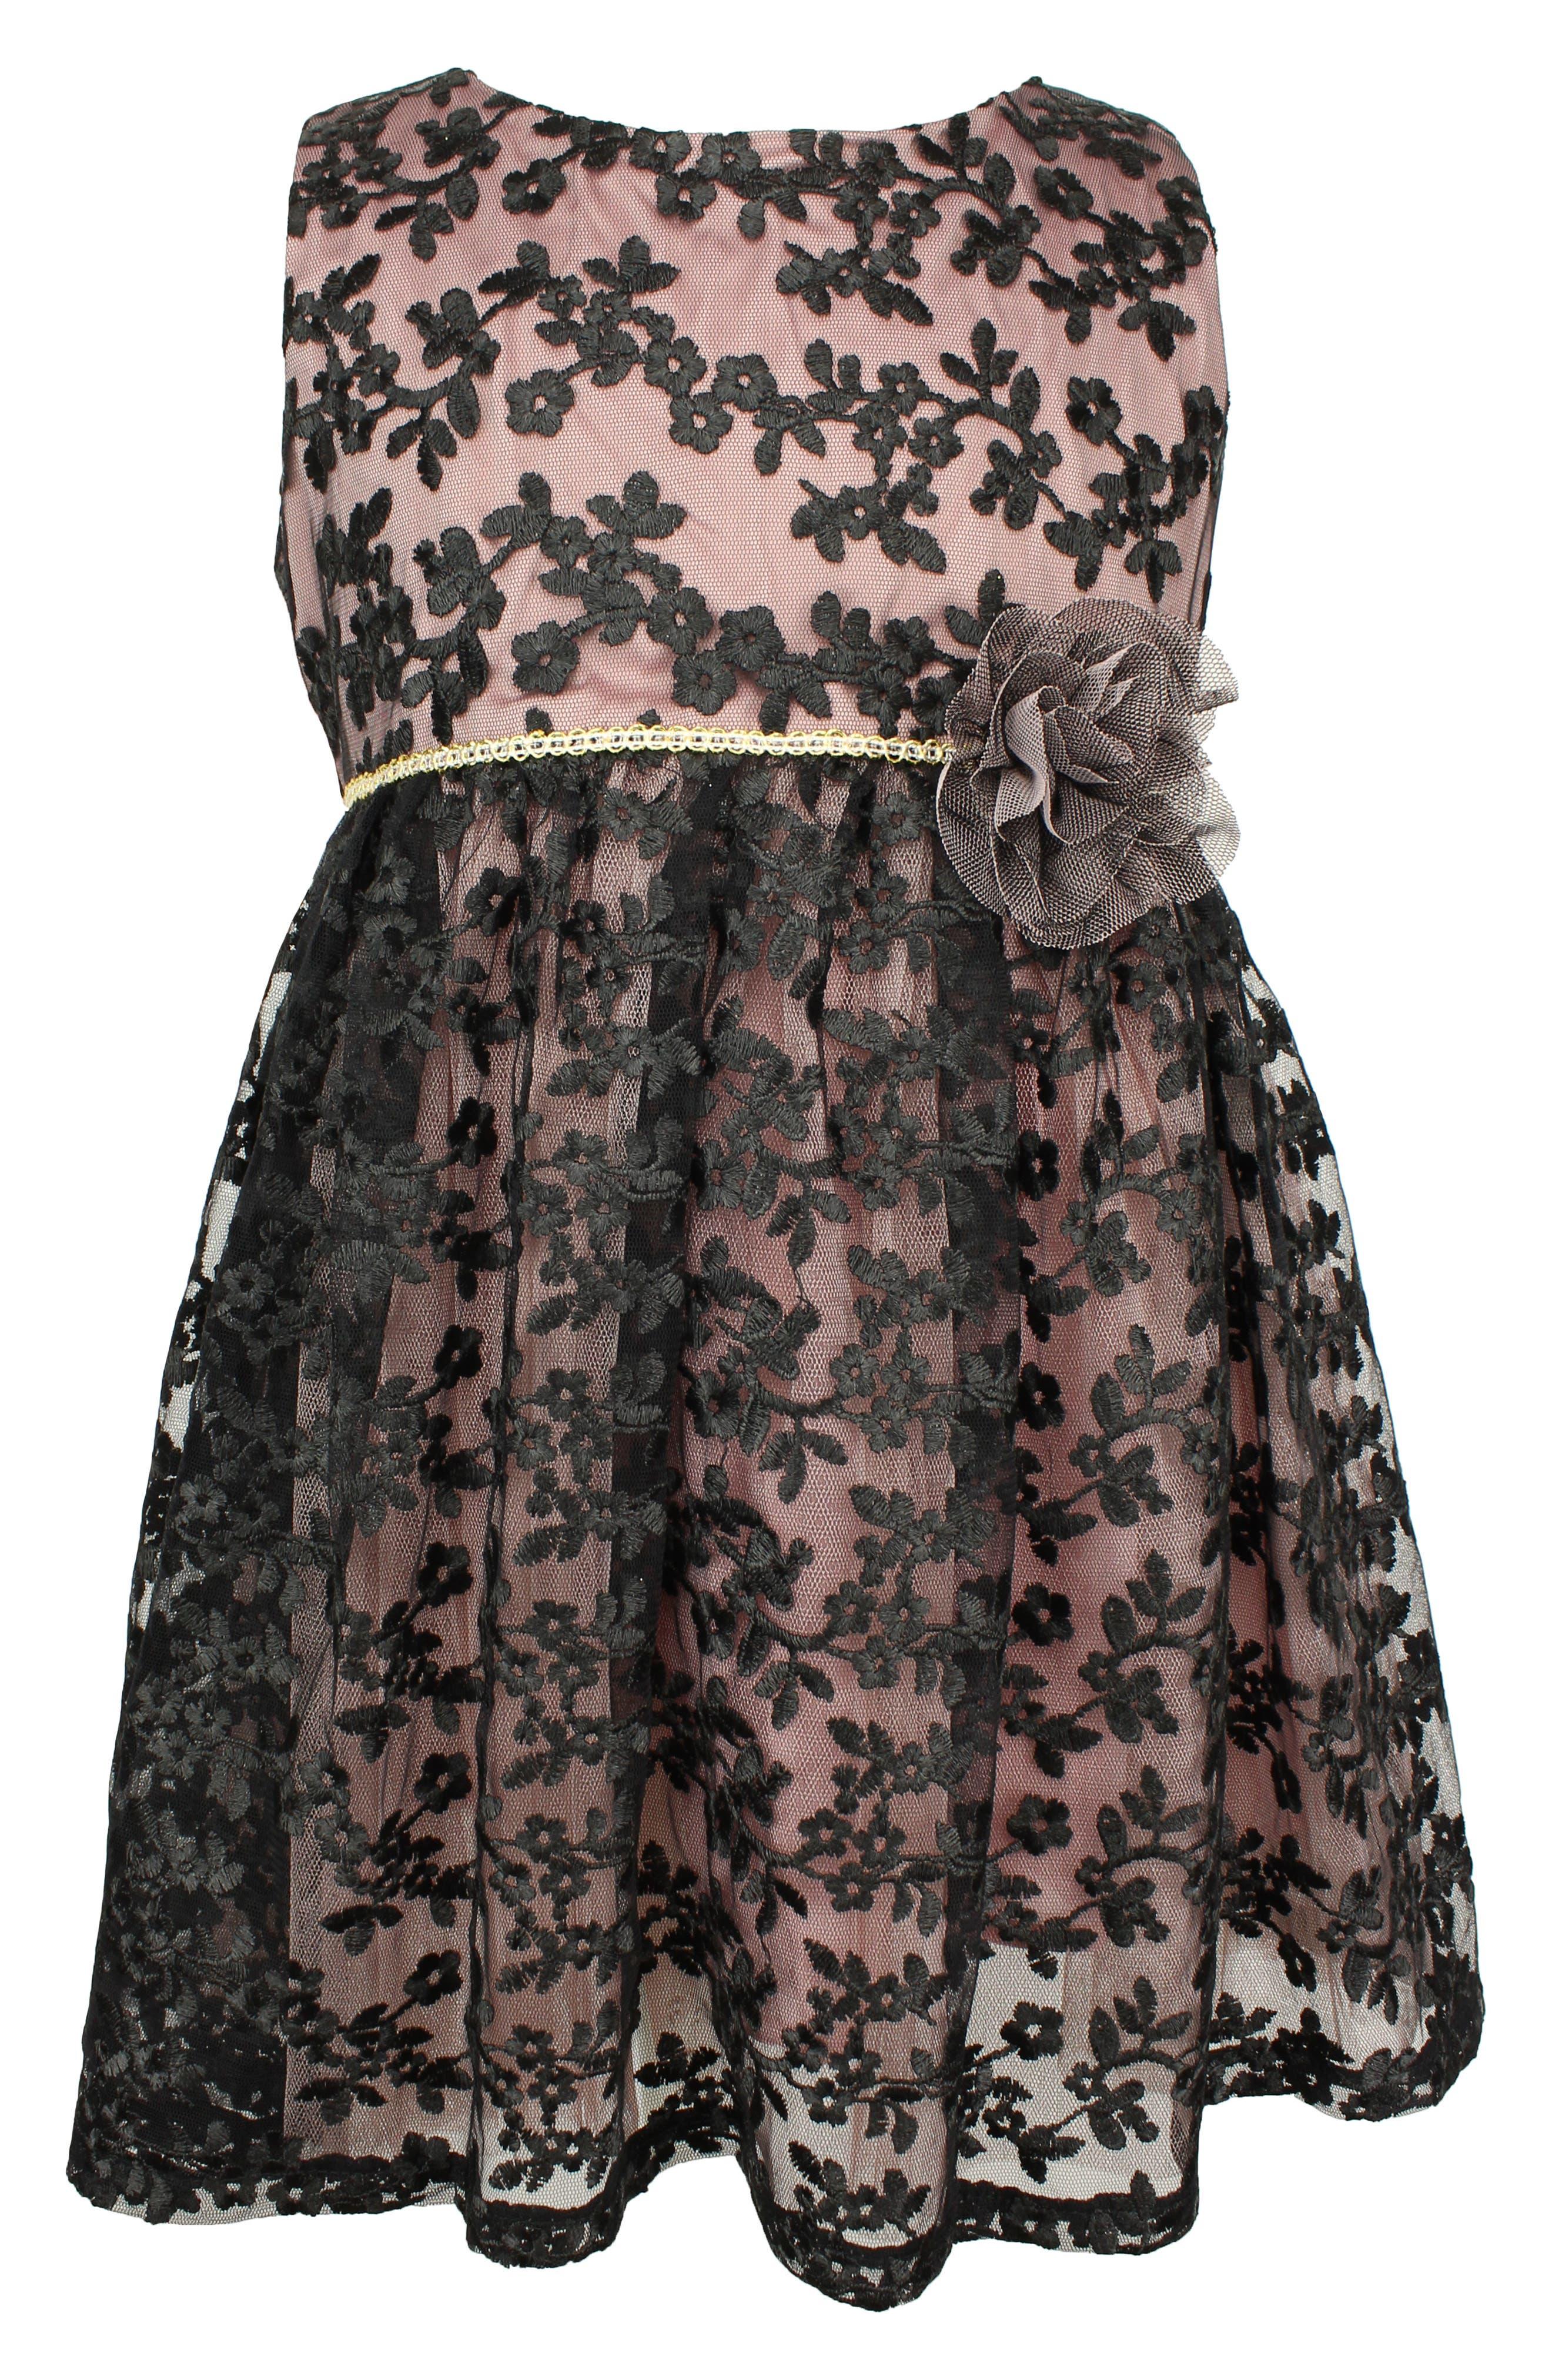 Image of Popatu Black Lace Dress